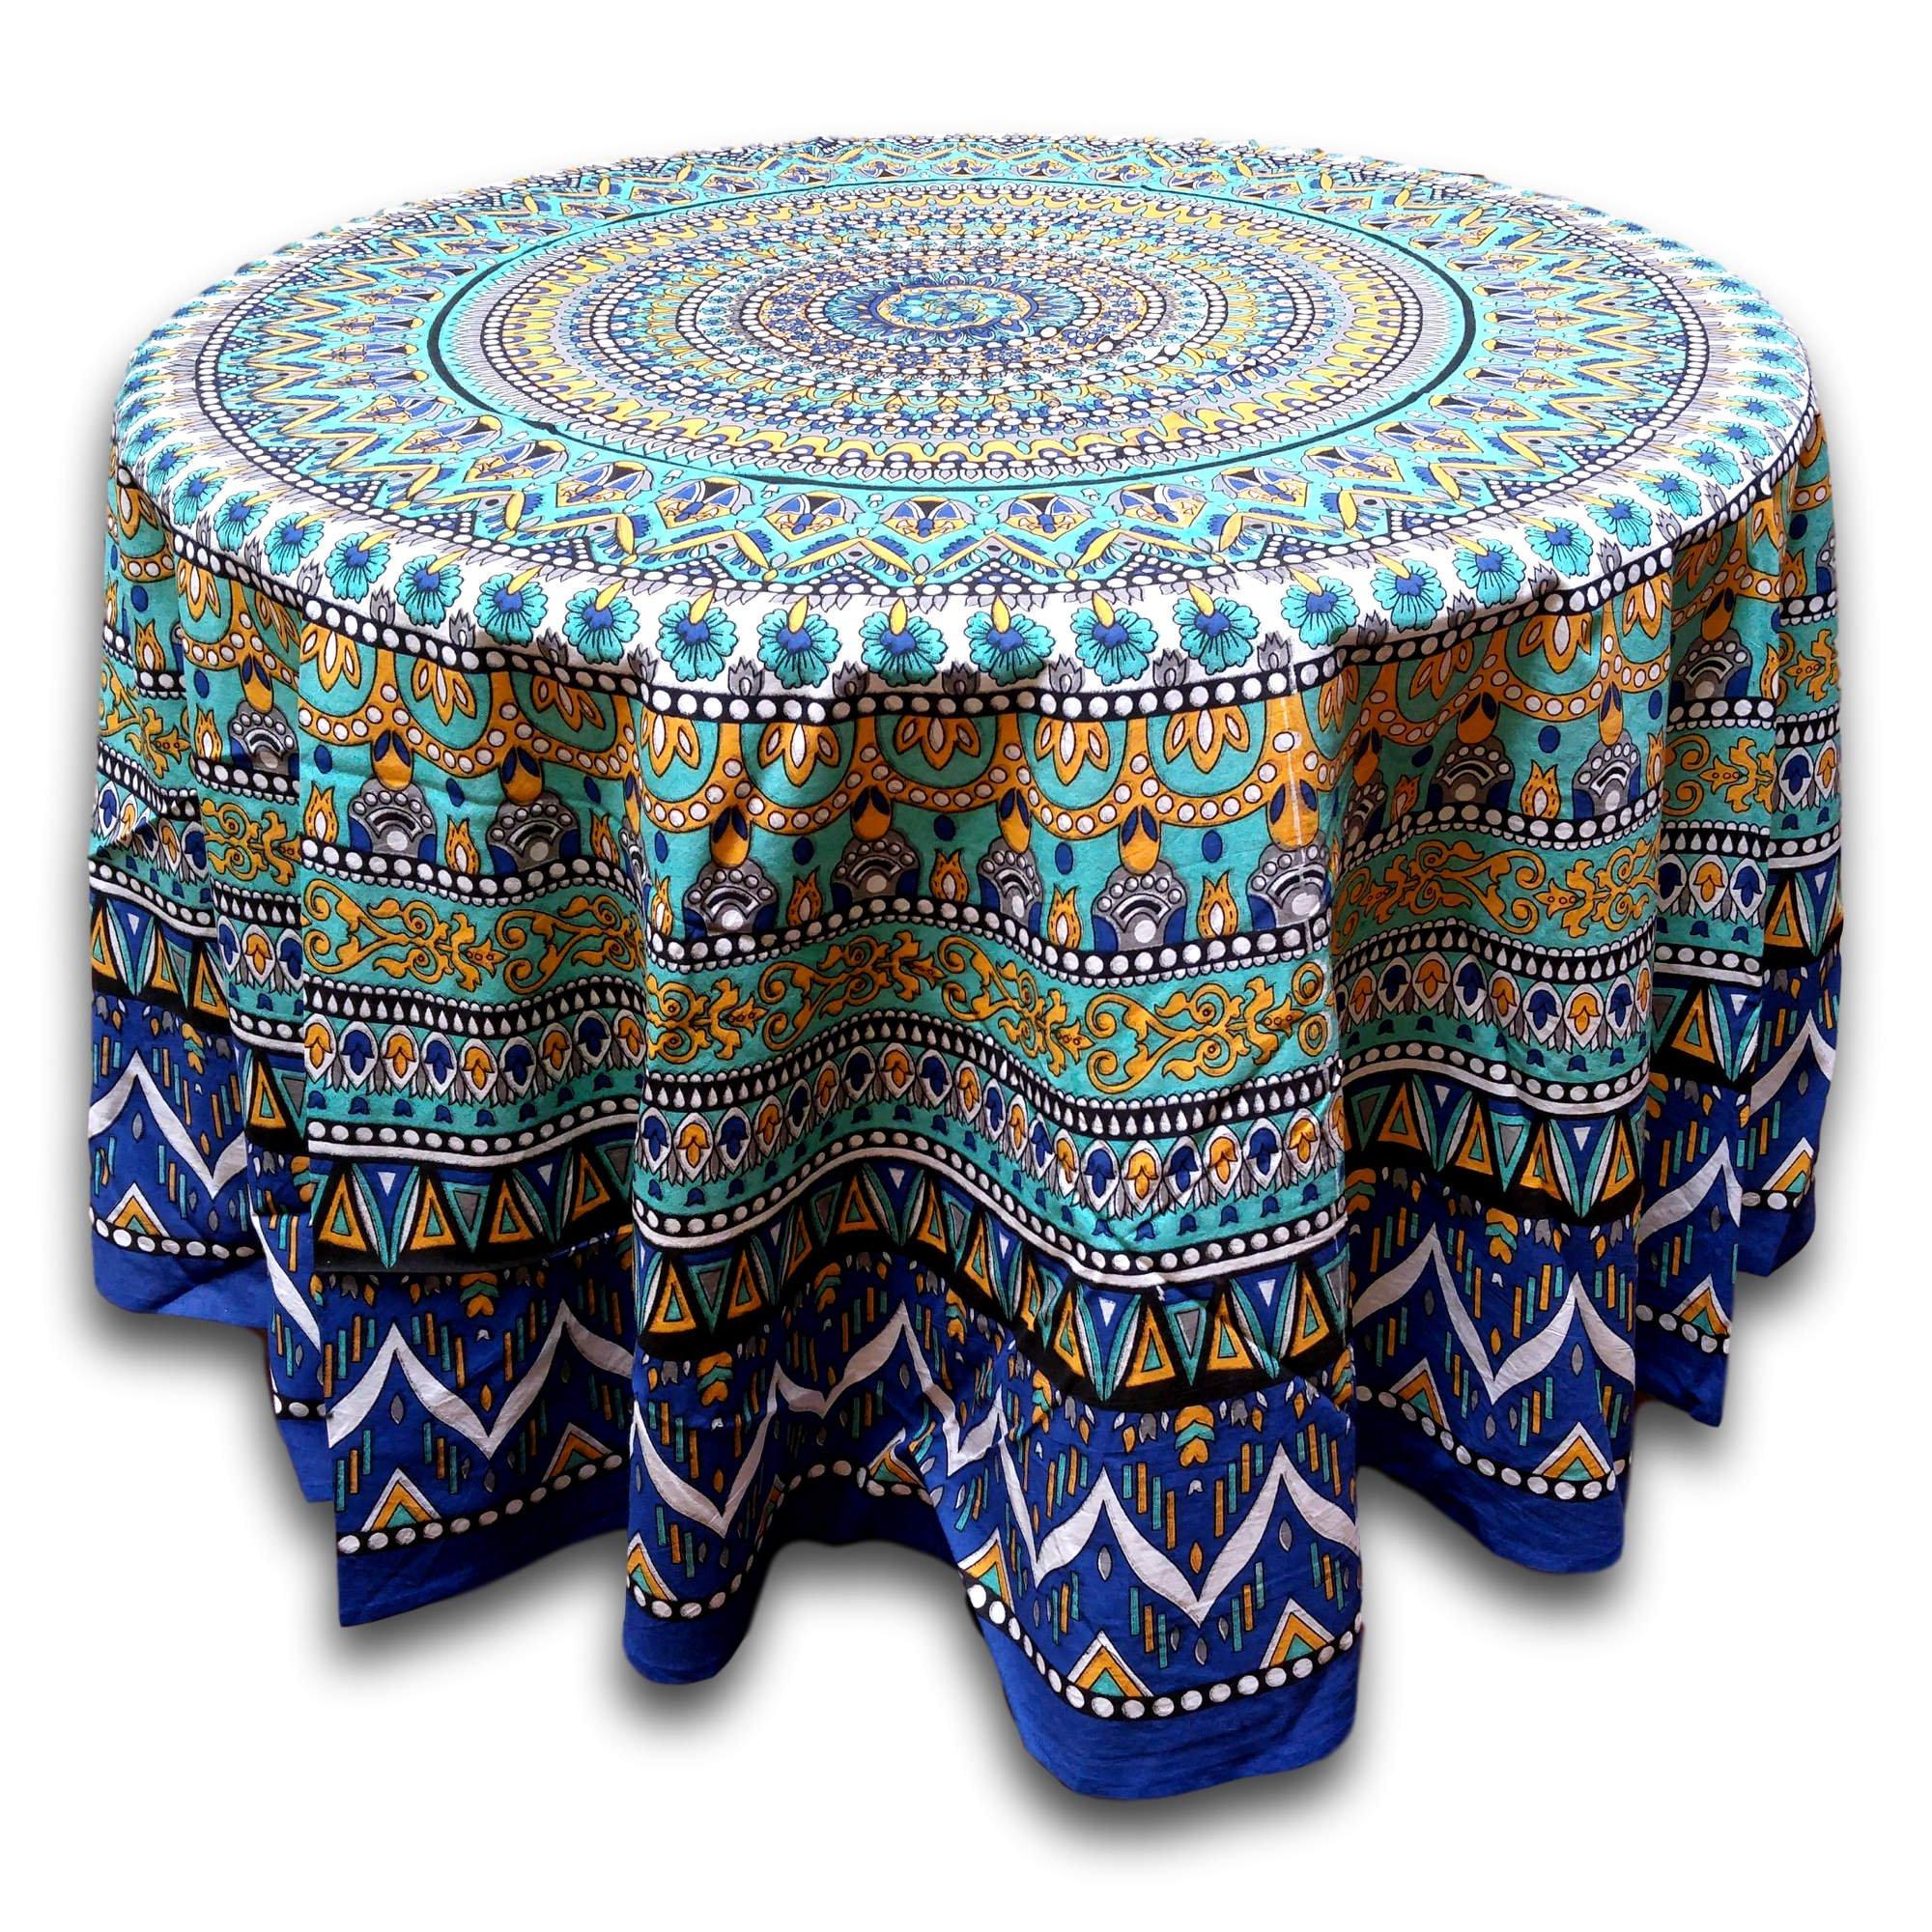 India Arts Handmade Cotton Geometric Mandala Floral Tablecloth Round Beach Sheet Beach Throw (Blue Green, 88 inches Round)